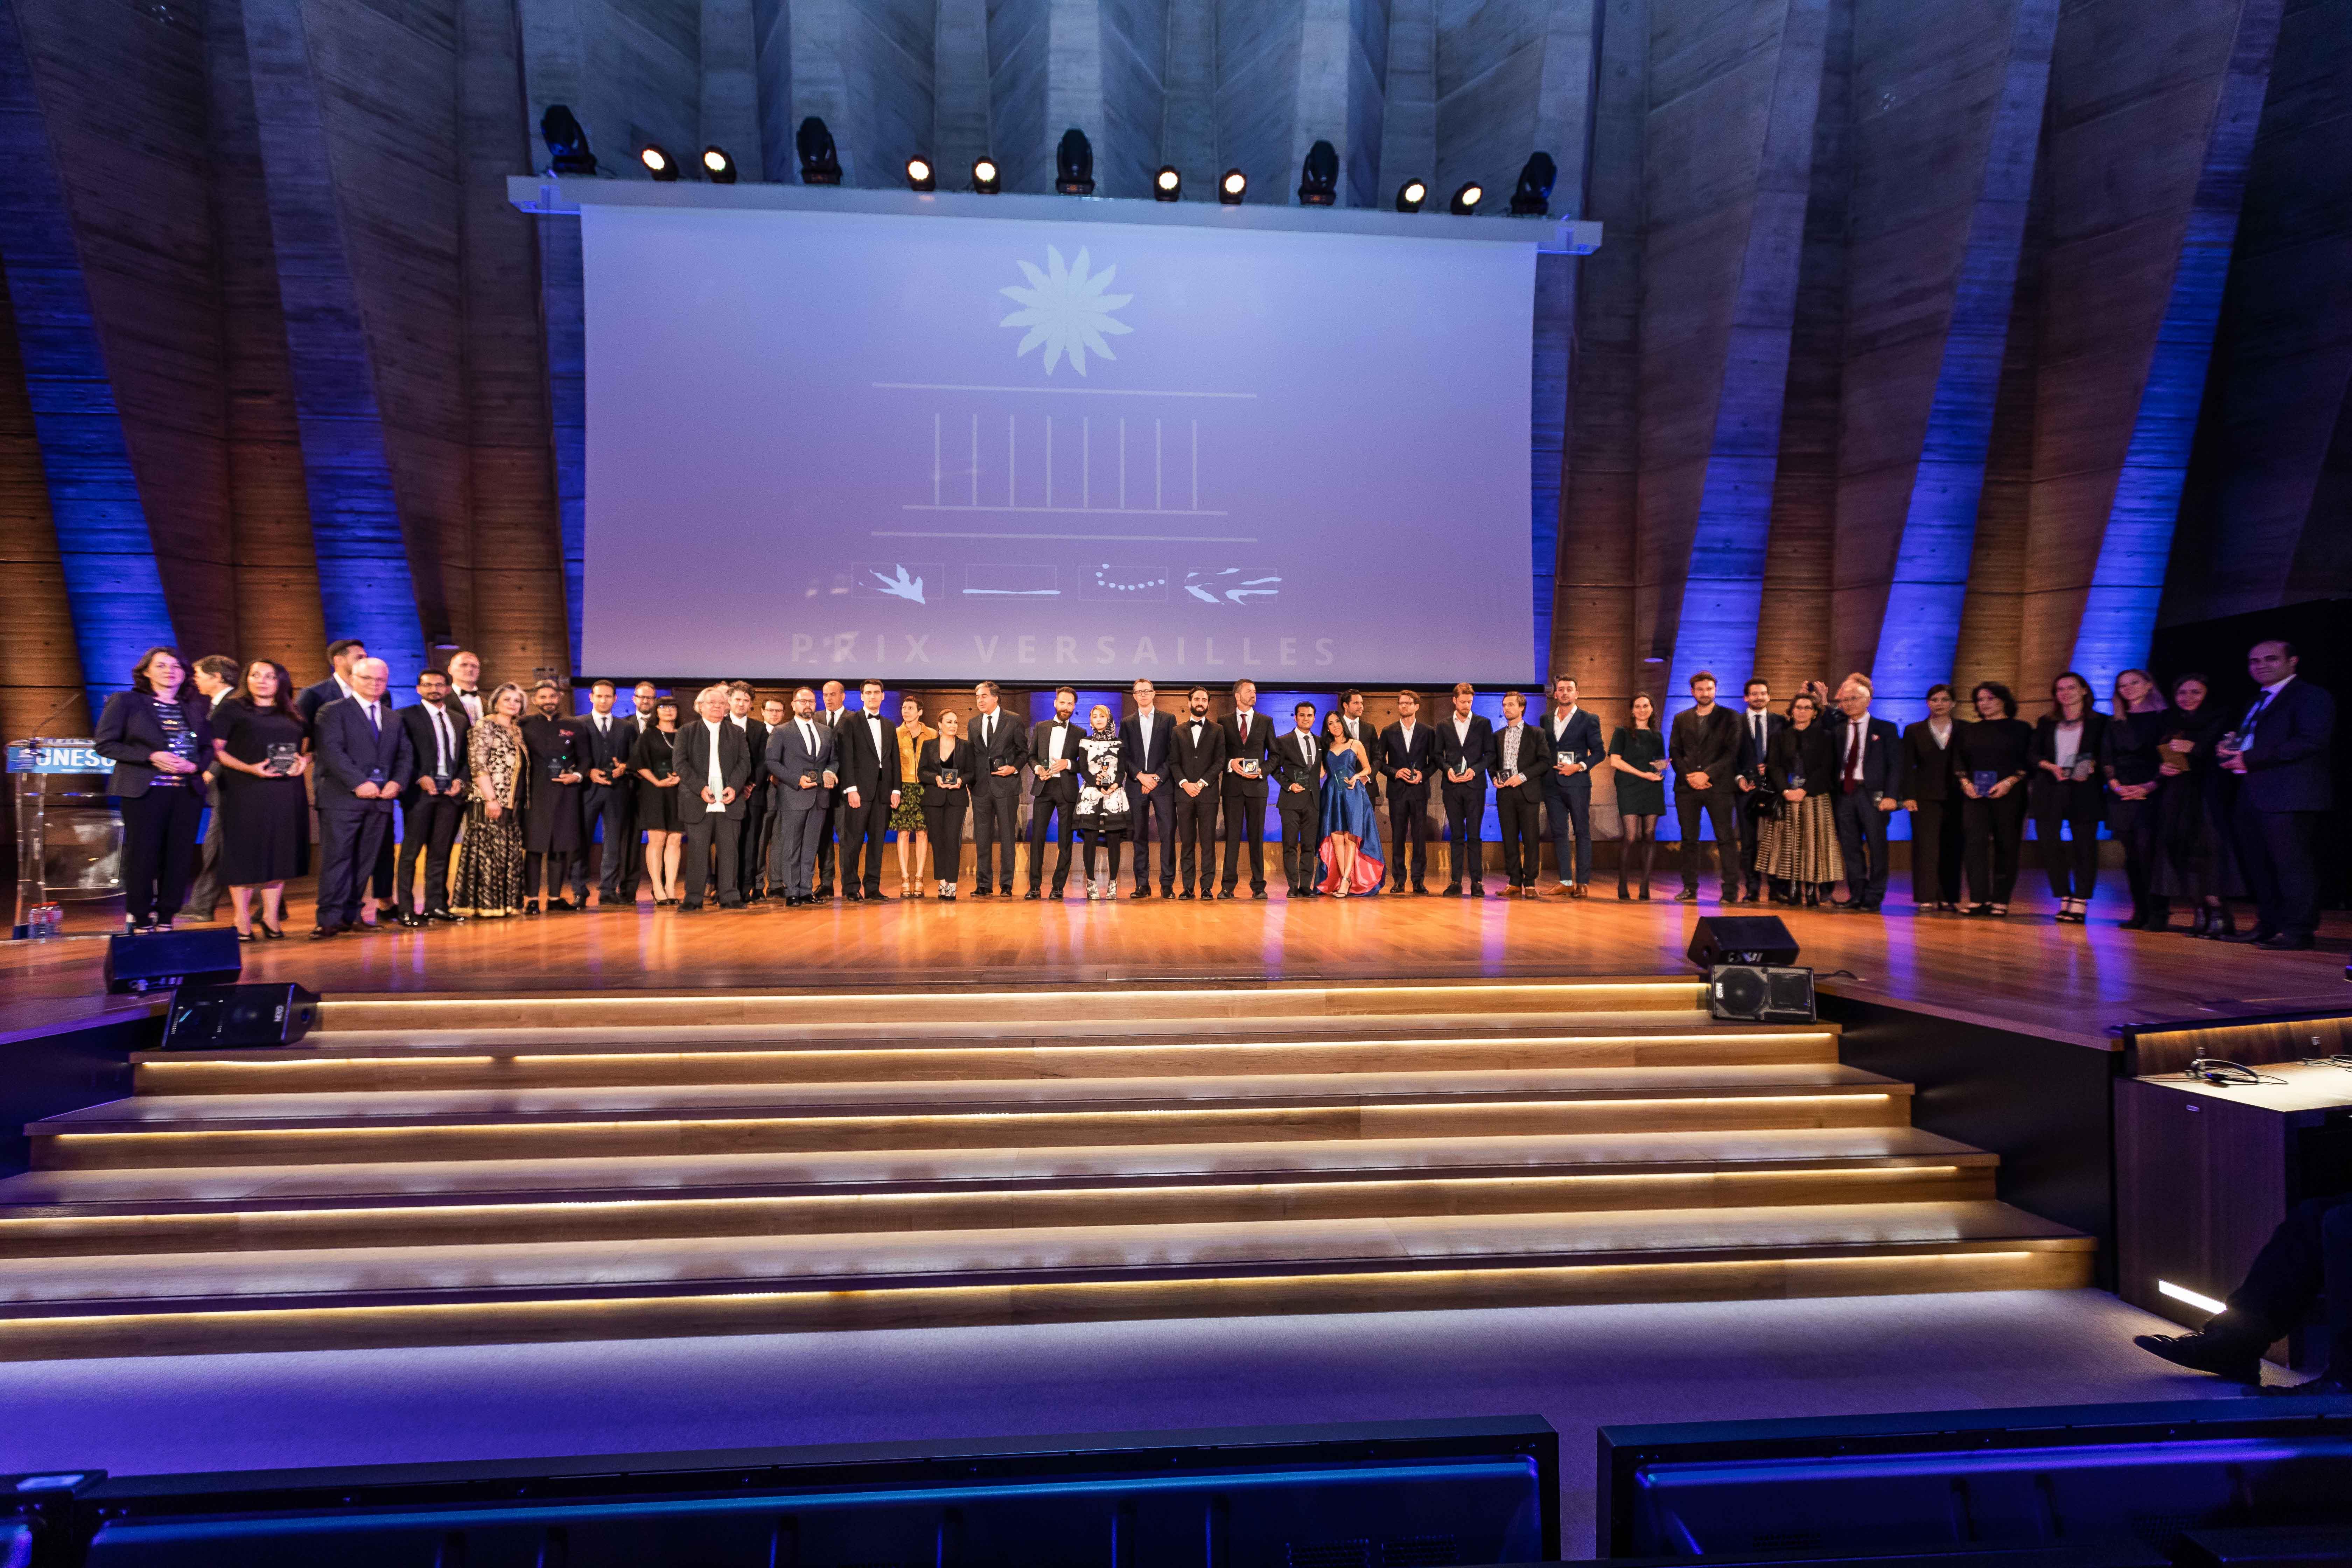 Prix Versailles award winners